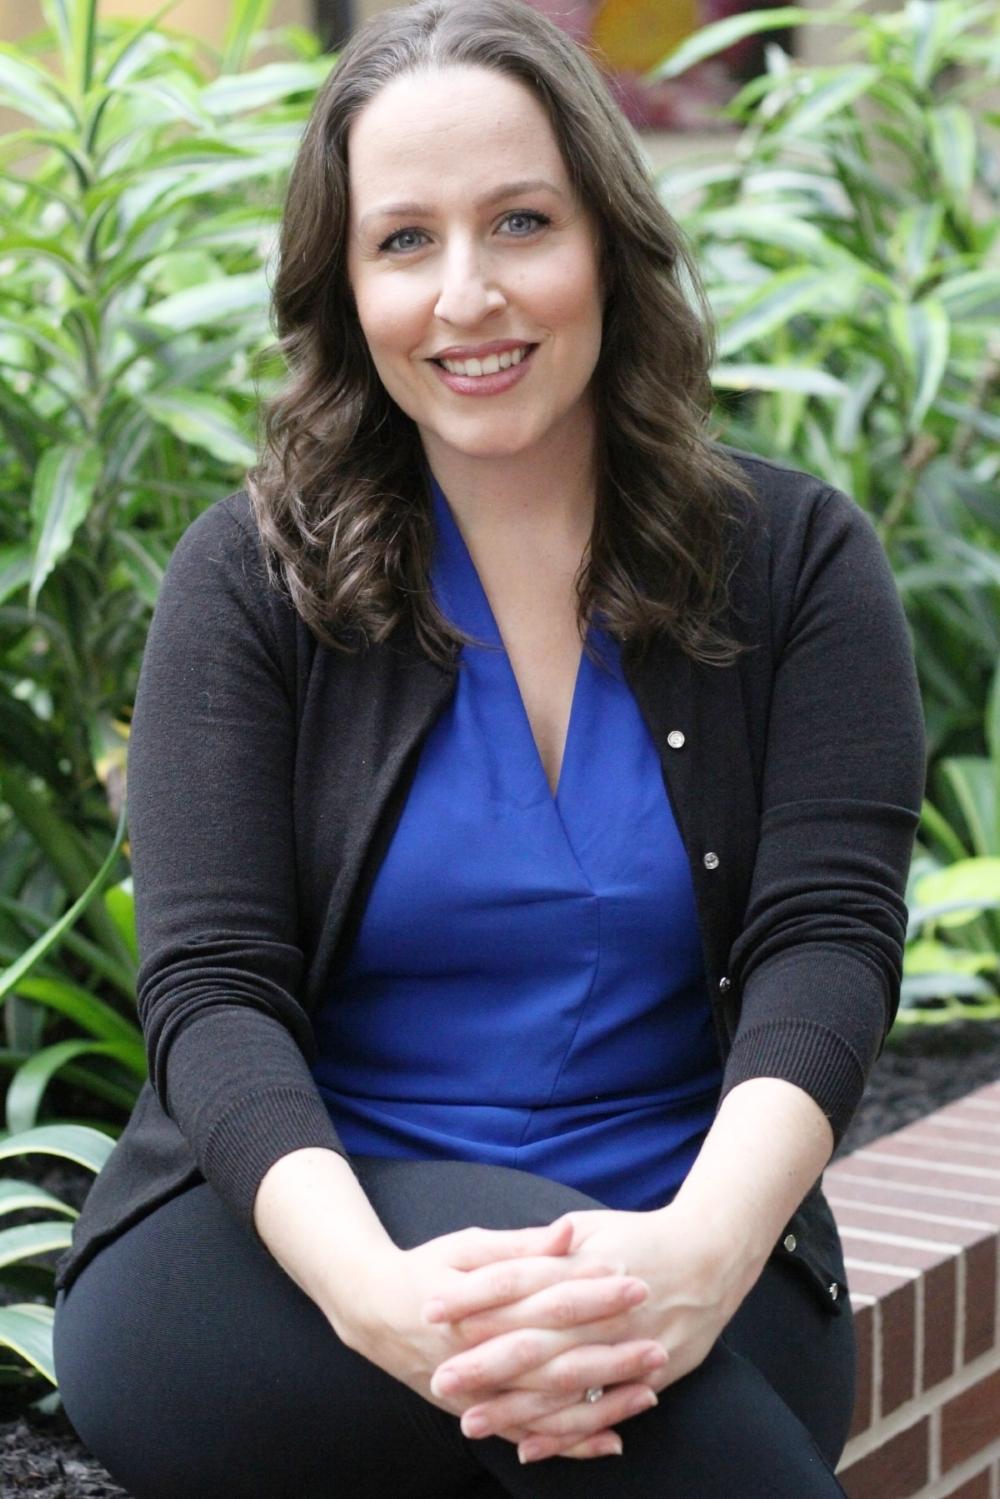 Event planner Allison Seijo - Michelle Perez Events